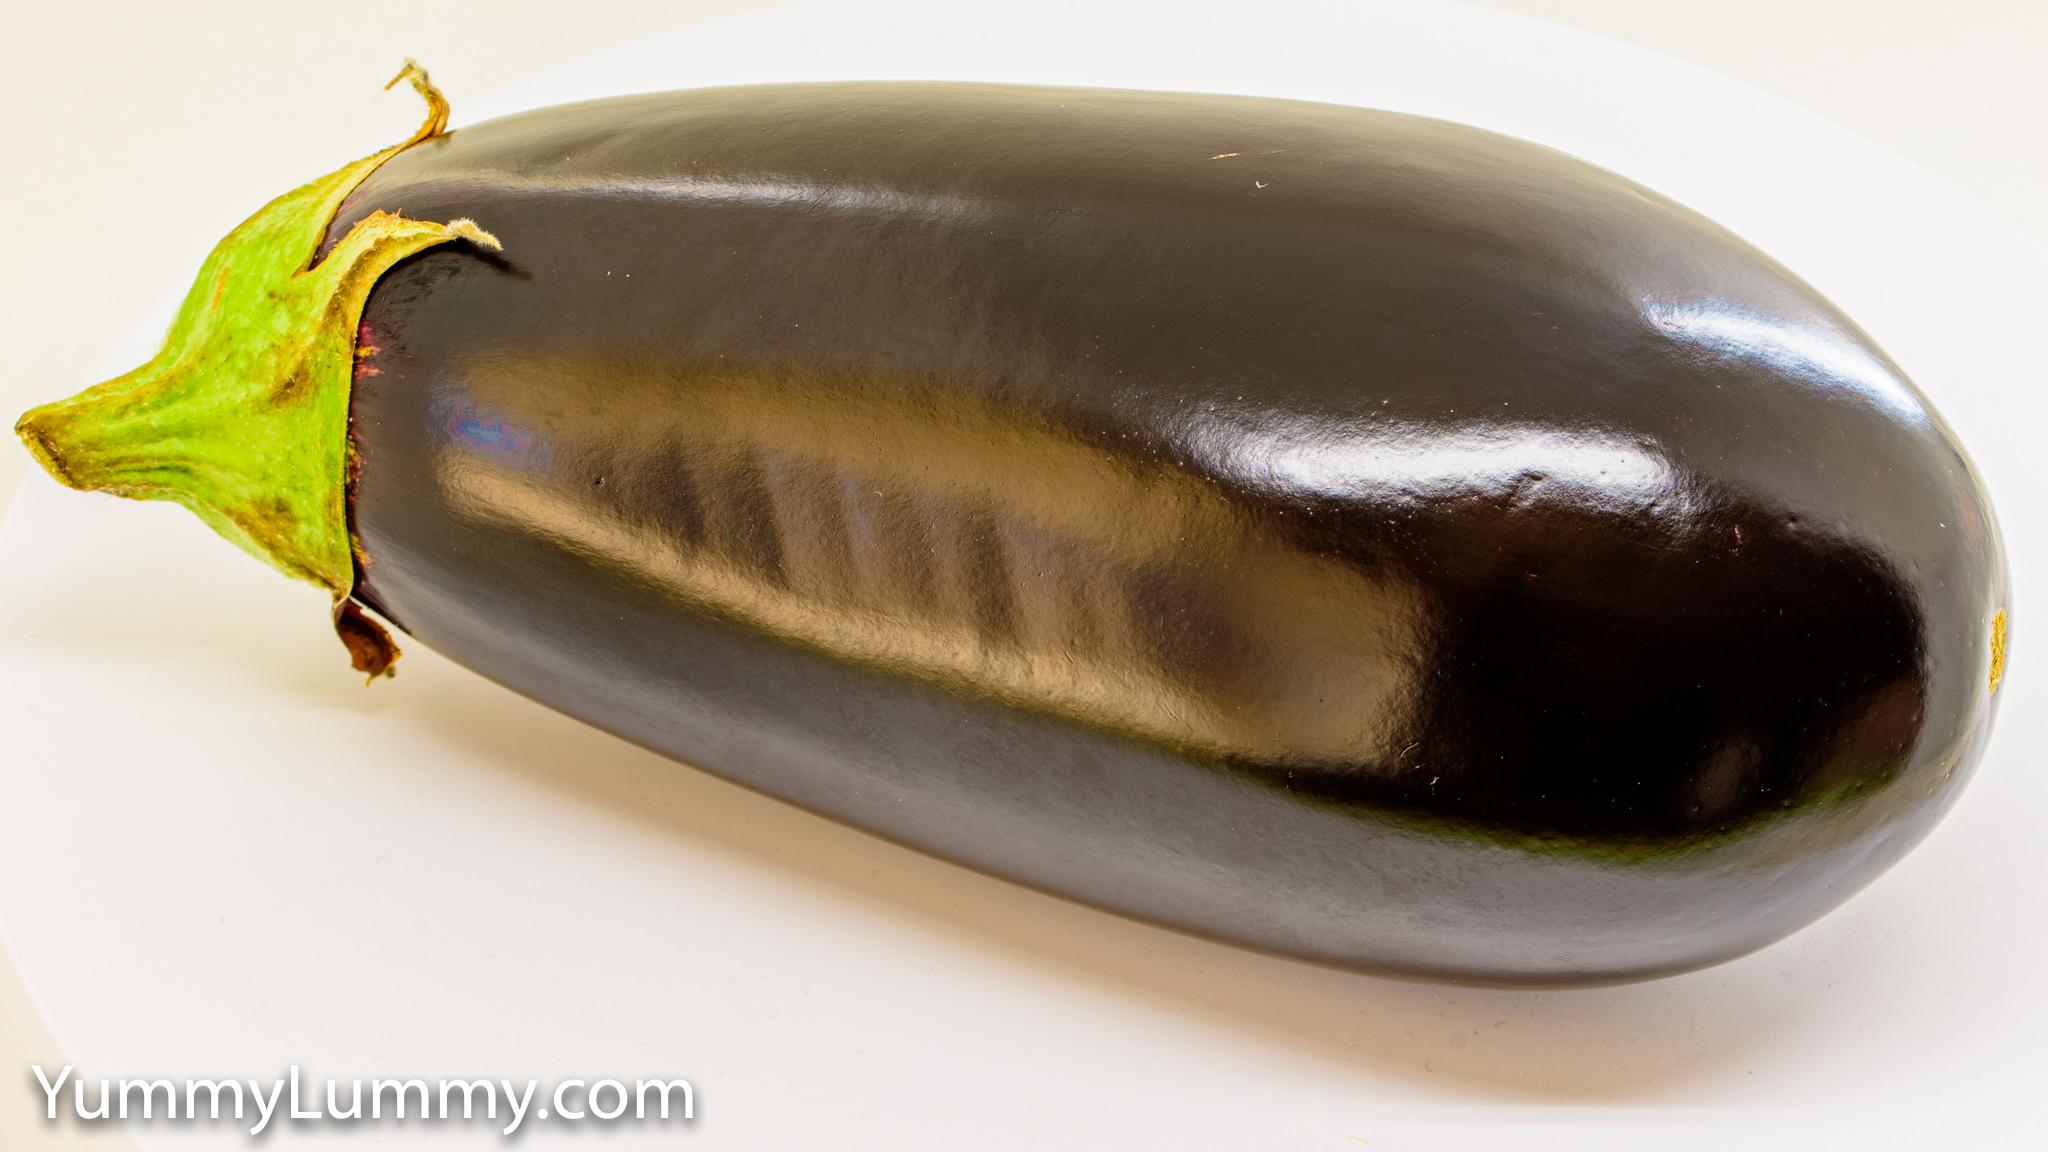 Photograph of an eggplant or aubergine or the 🍆 Gary Lum